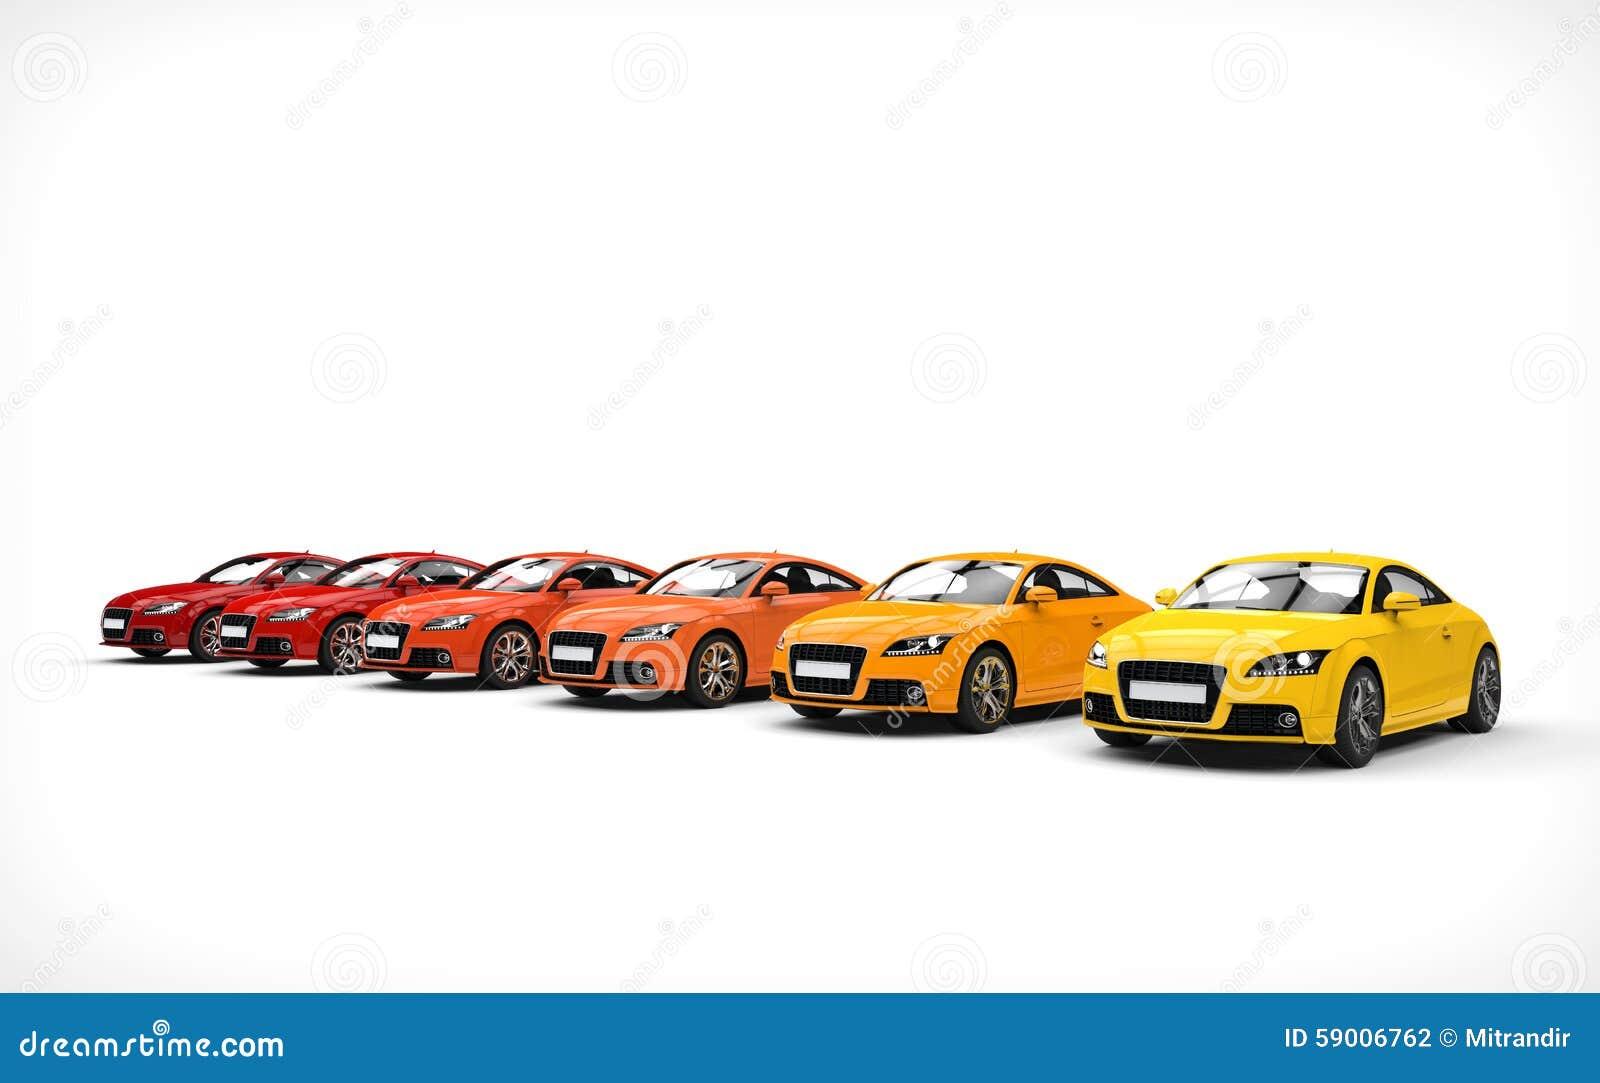 Line Of Cars - Warm Colors stock illustration. Illustration of ...